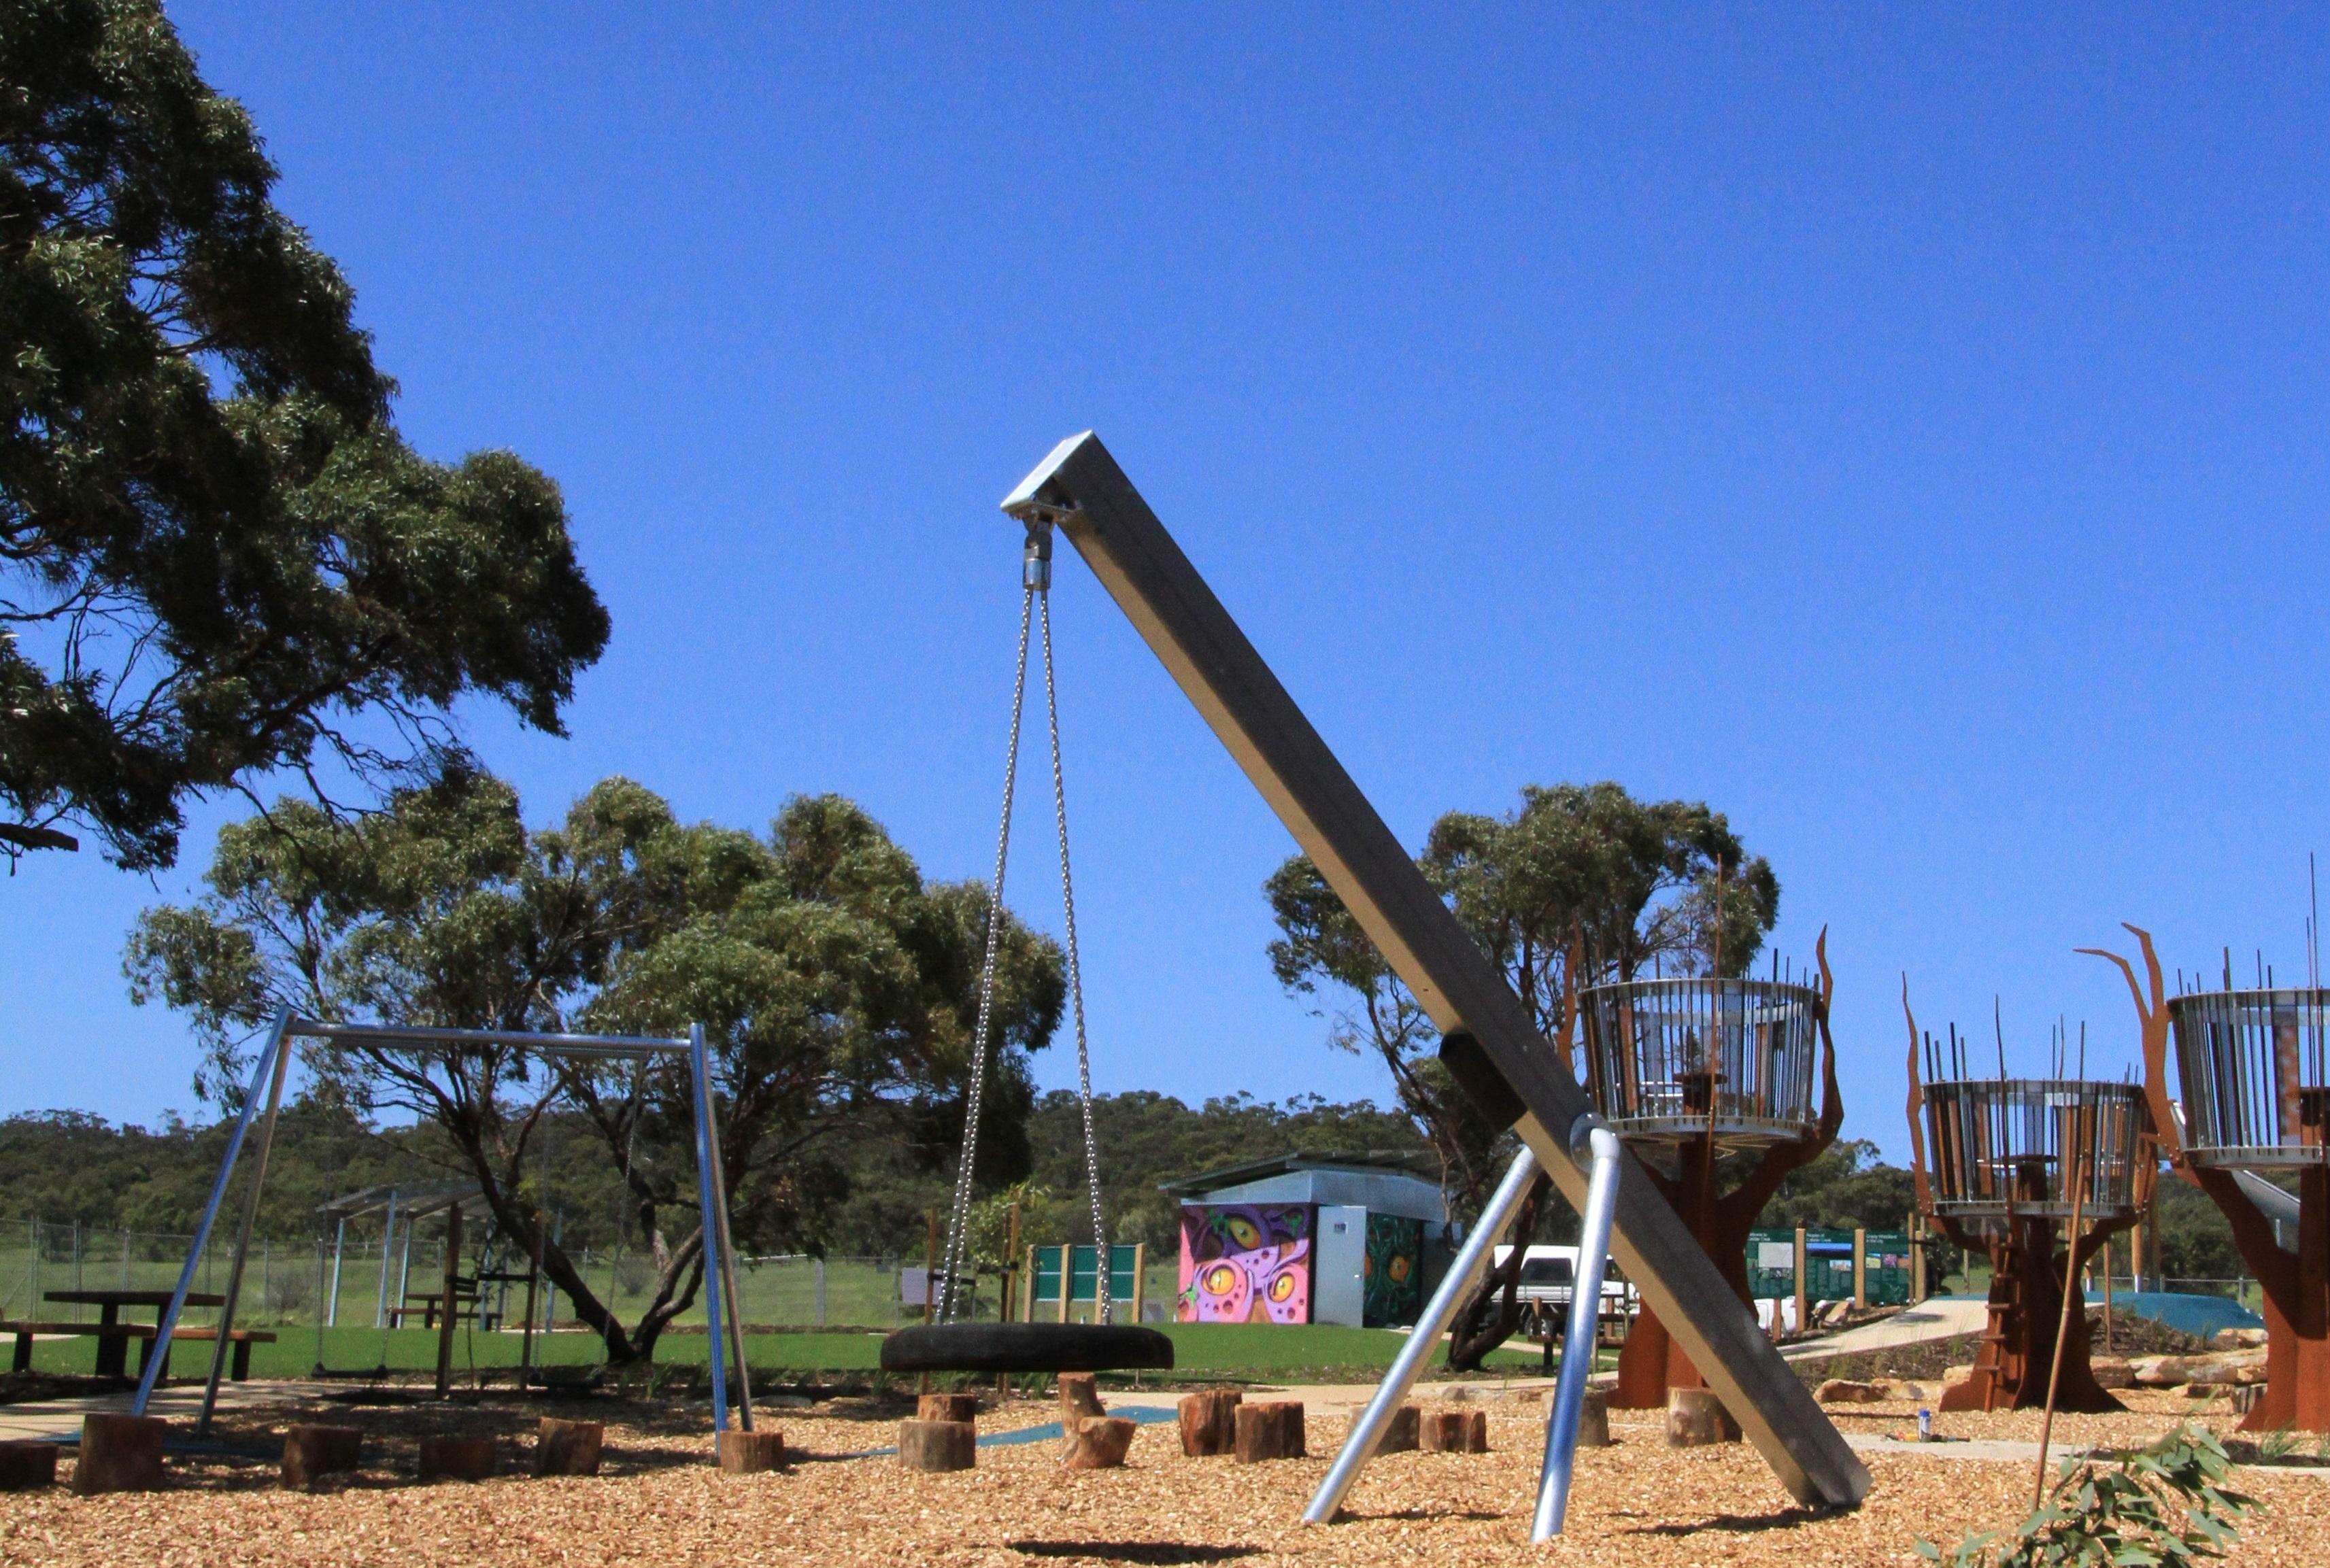 3 Raptor-themed playground